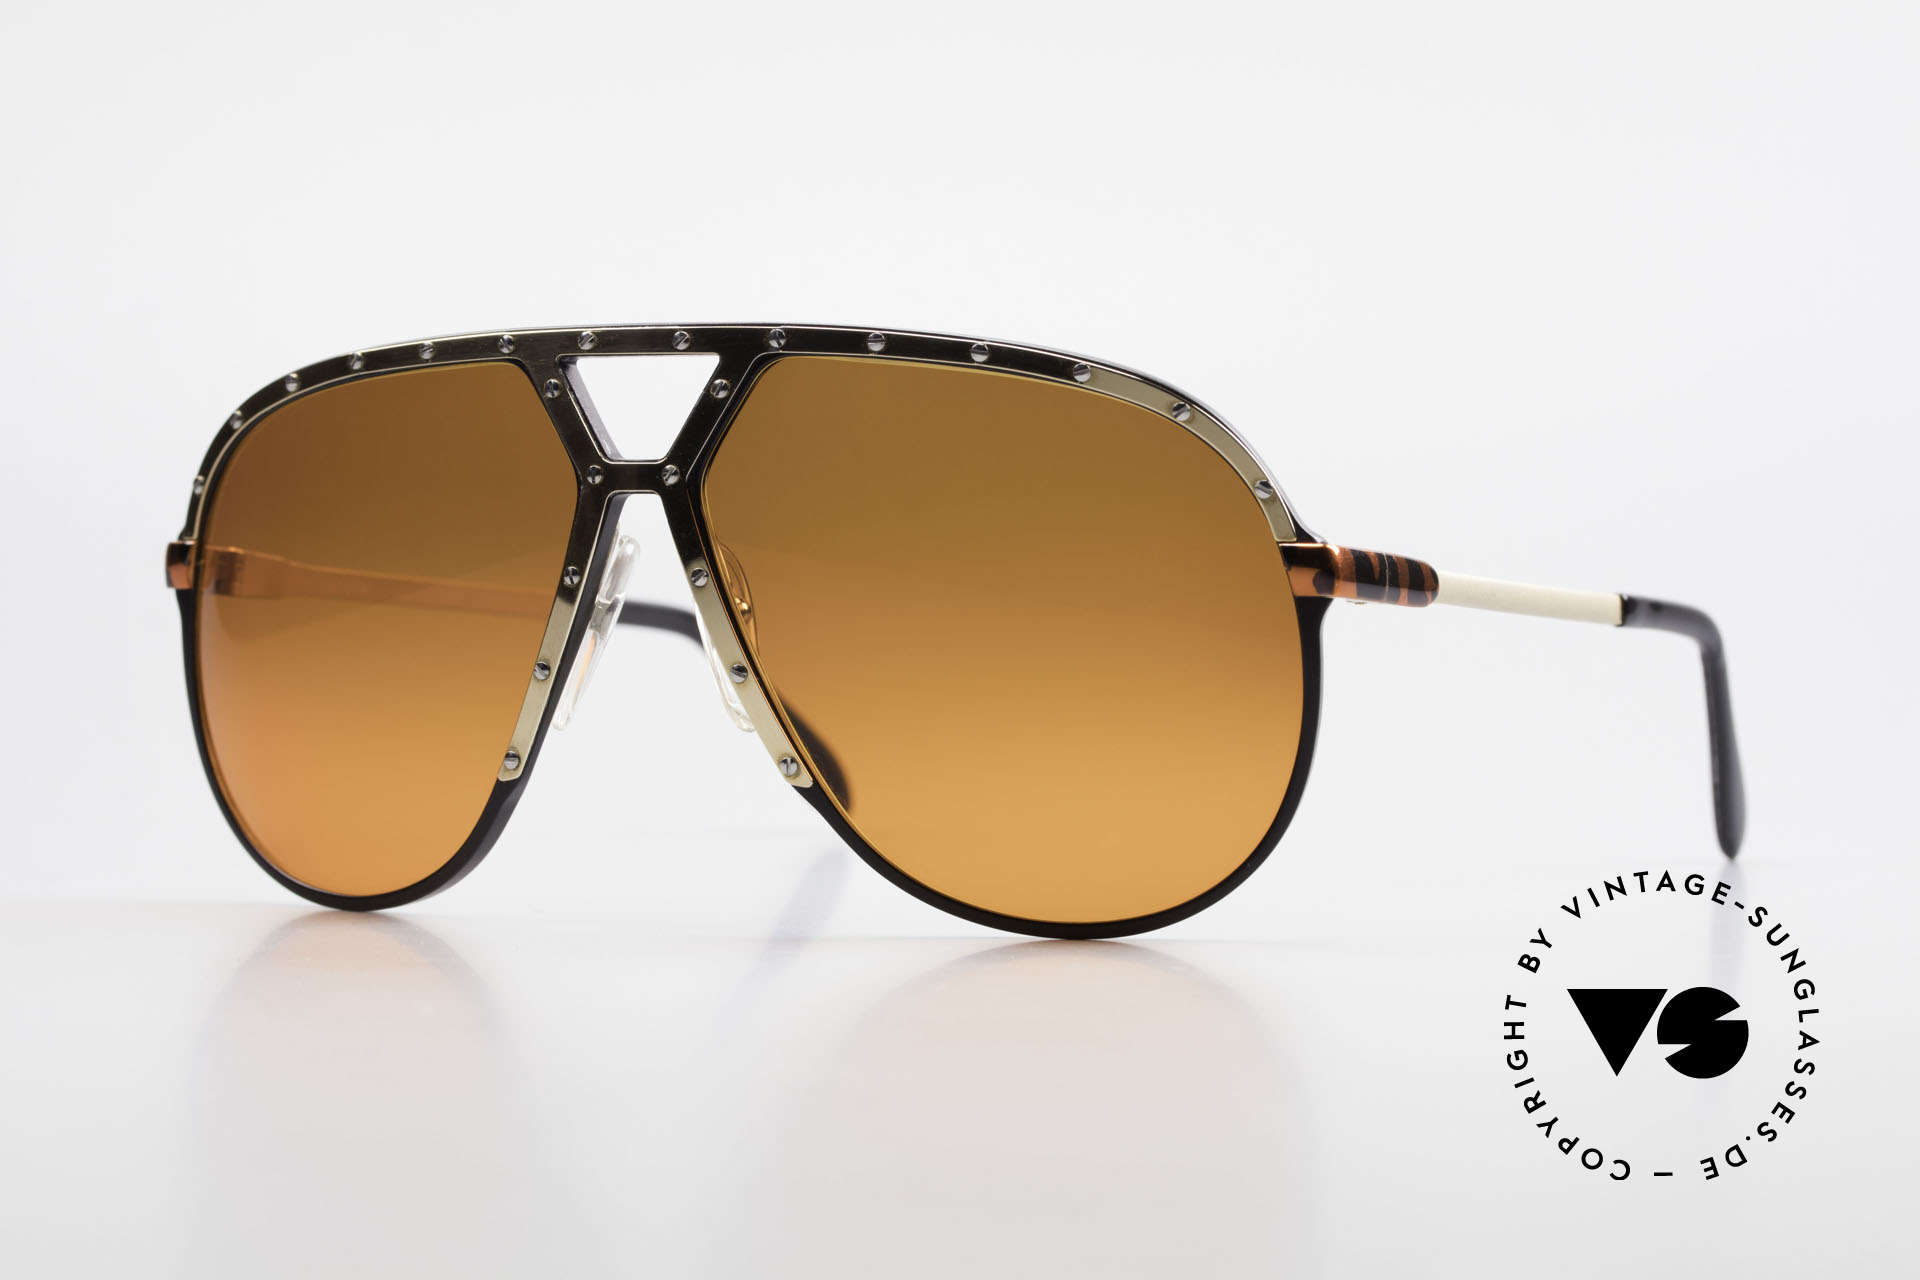 Alpina M1 80s Shades Customized Edition, customized Alpina M1 1980's Aviator sunglasses, Made for Men